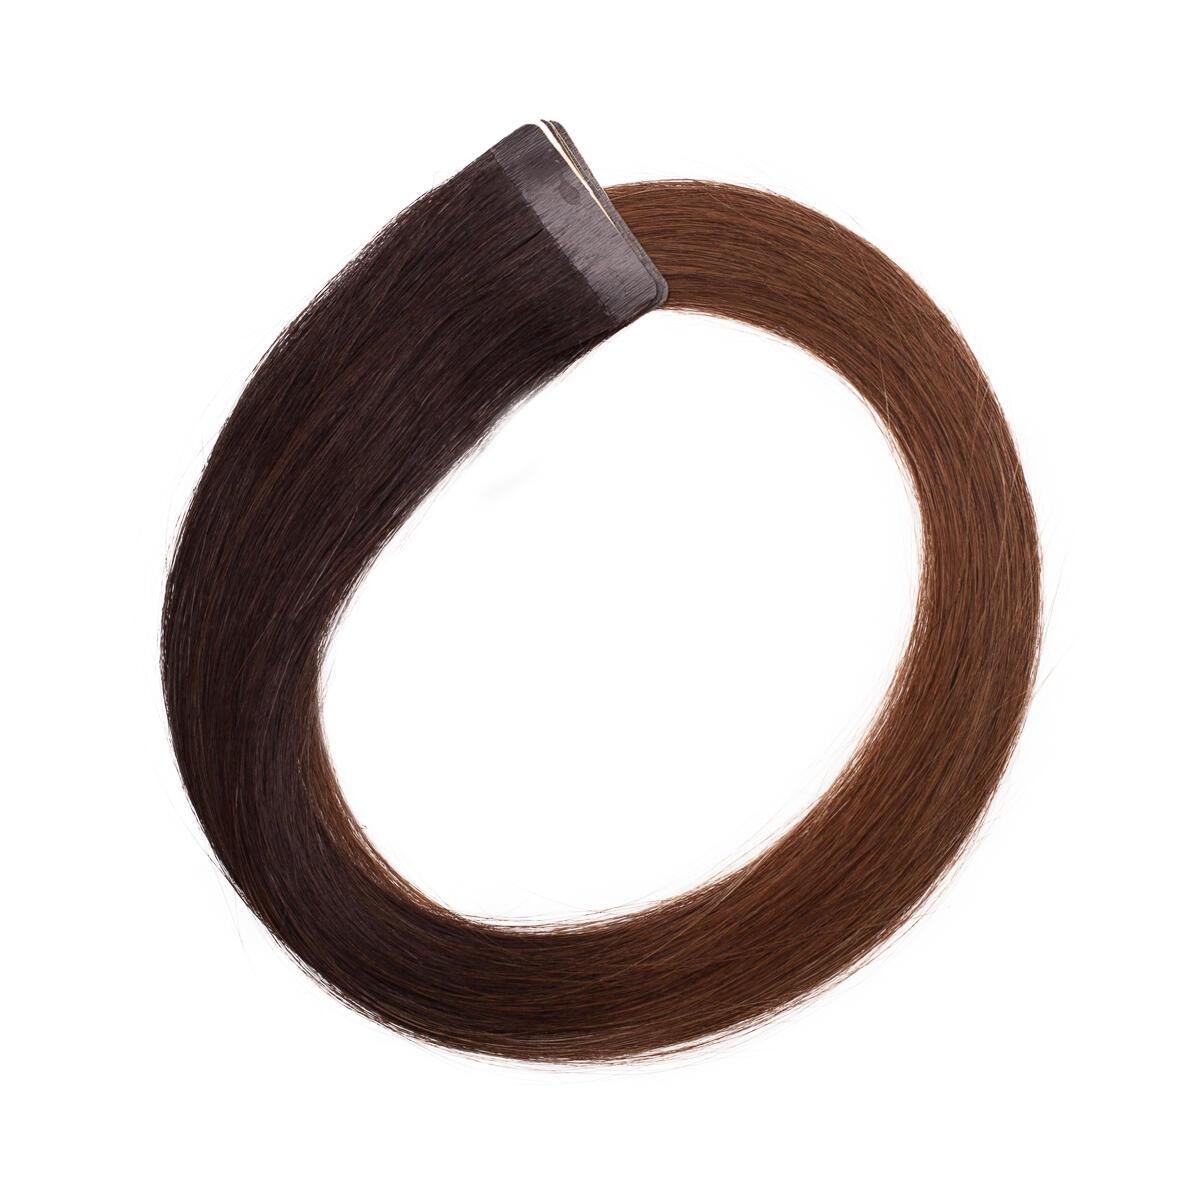 Quick & Easy Premium Glatt O2.3/5.0 Chocolate Brown Ombre 50 cm